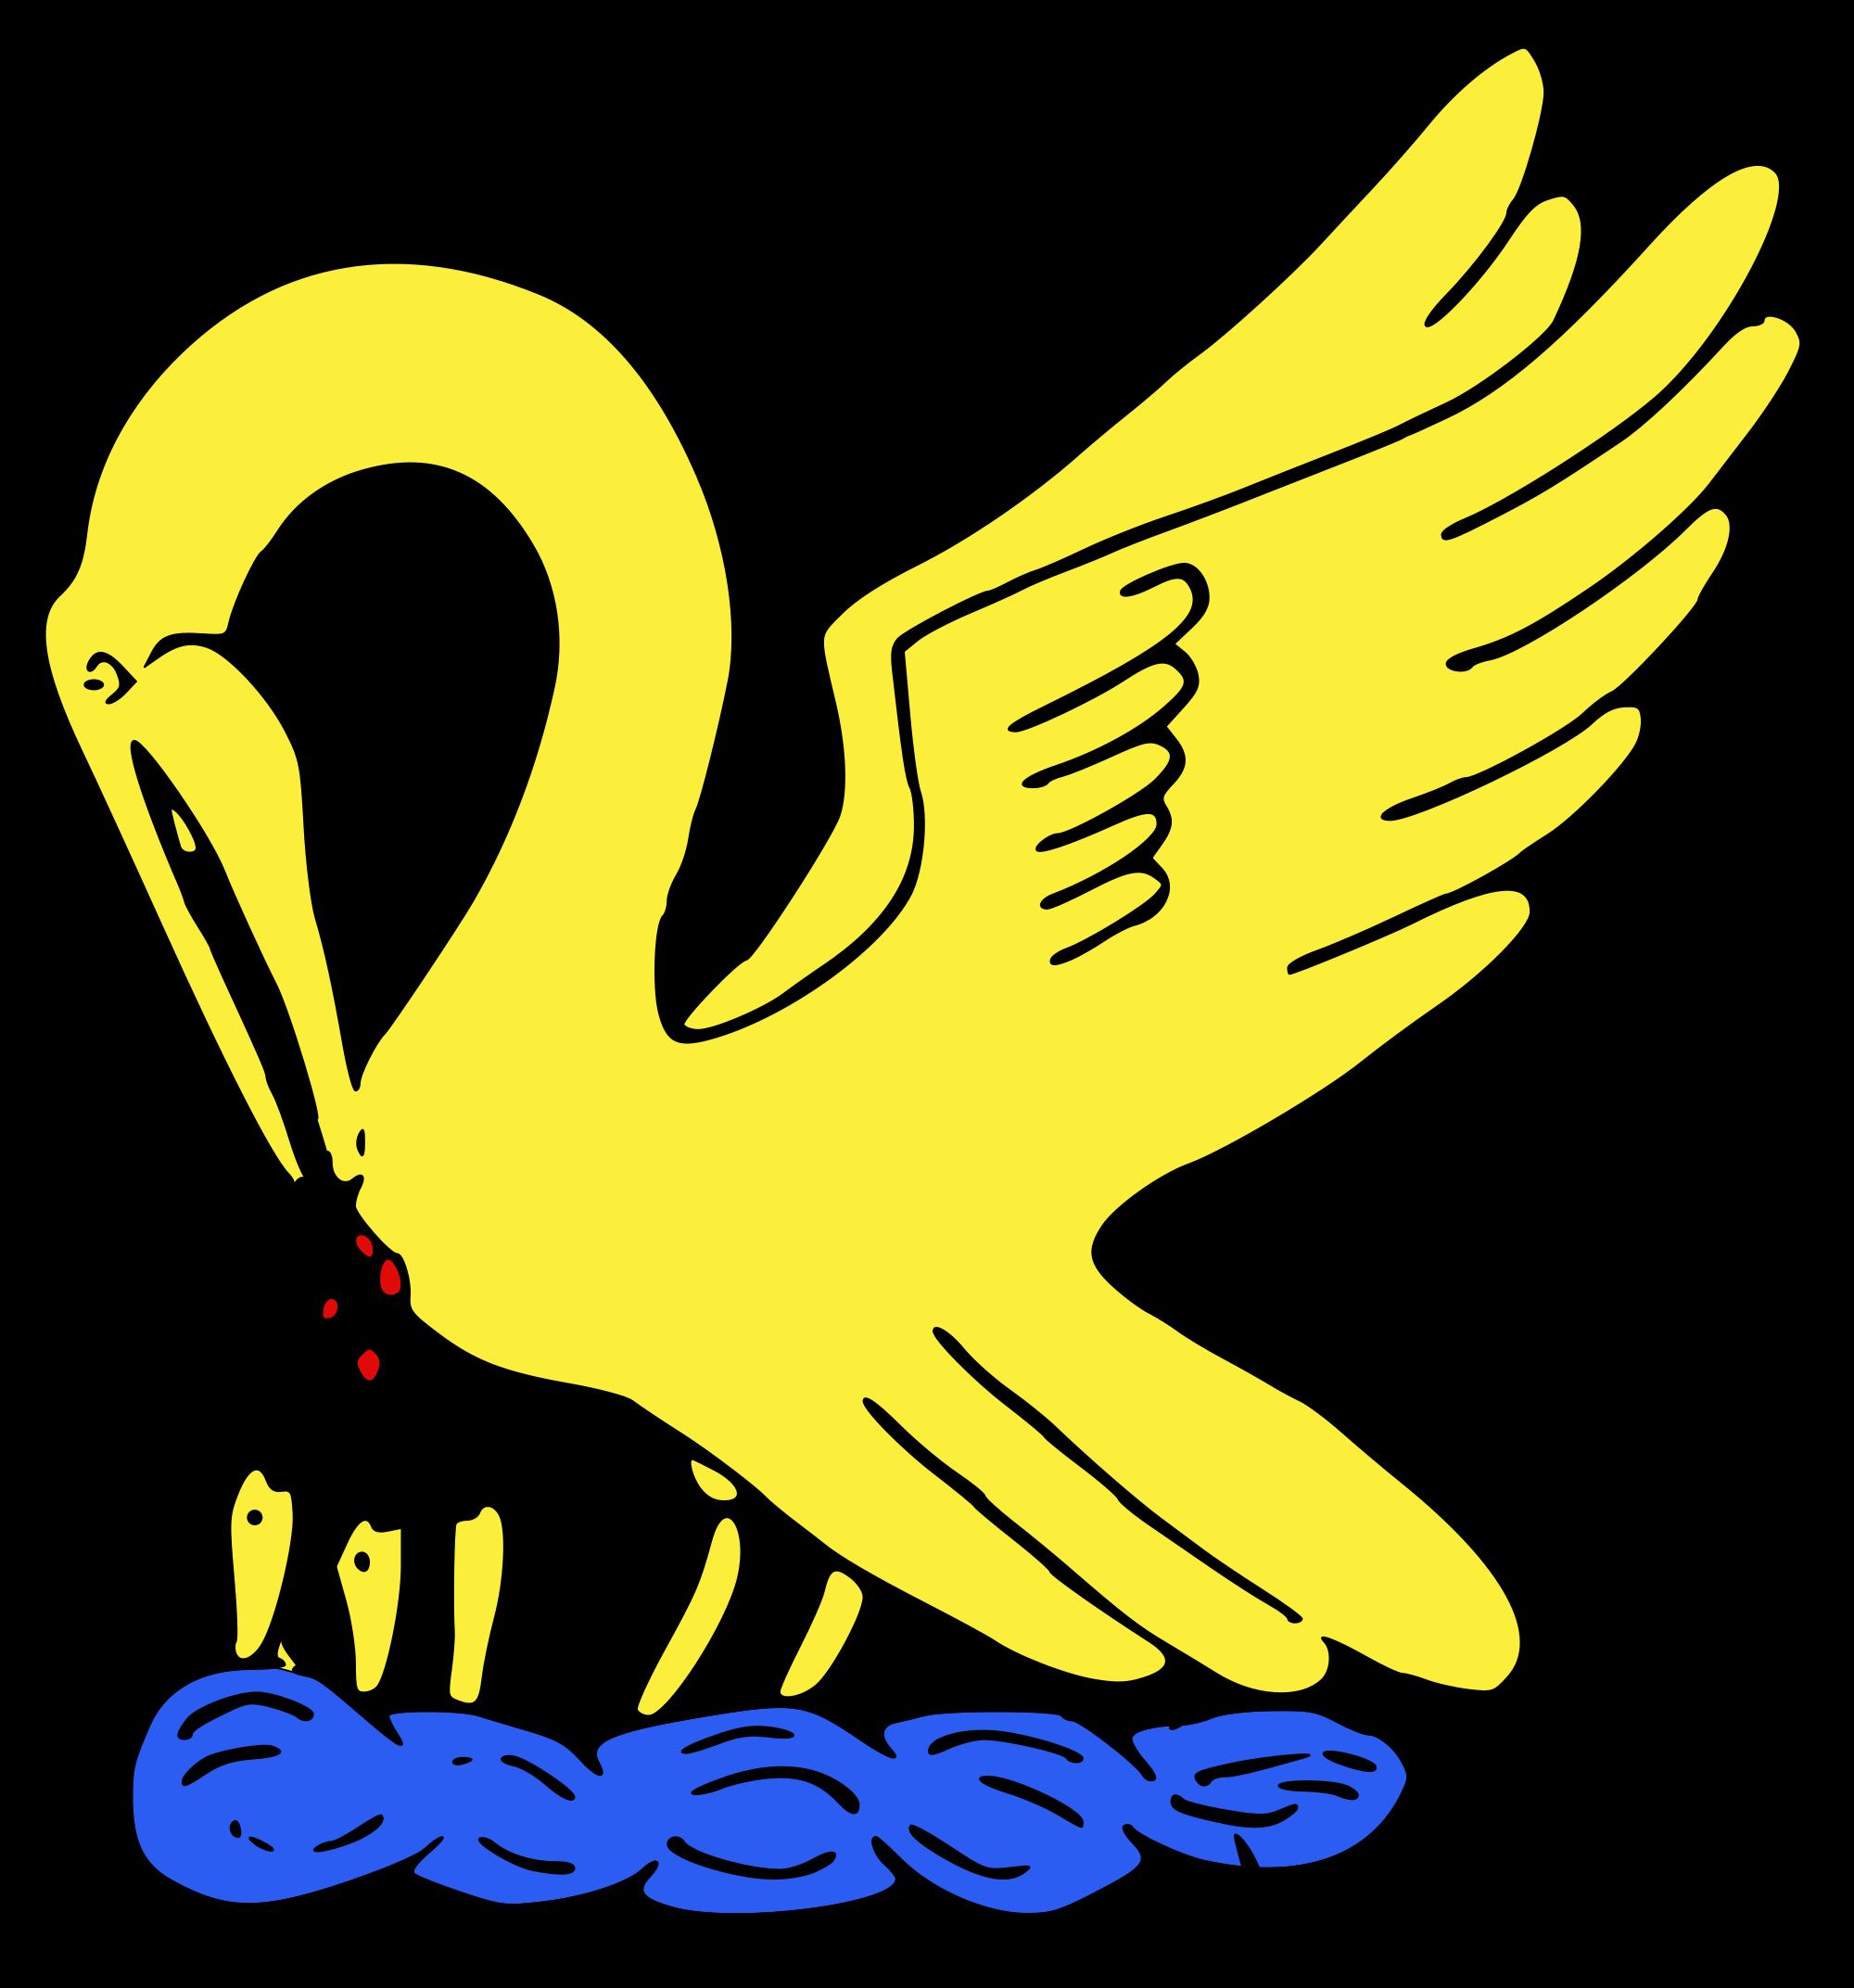 Pelican symbol louisiana